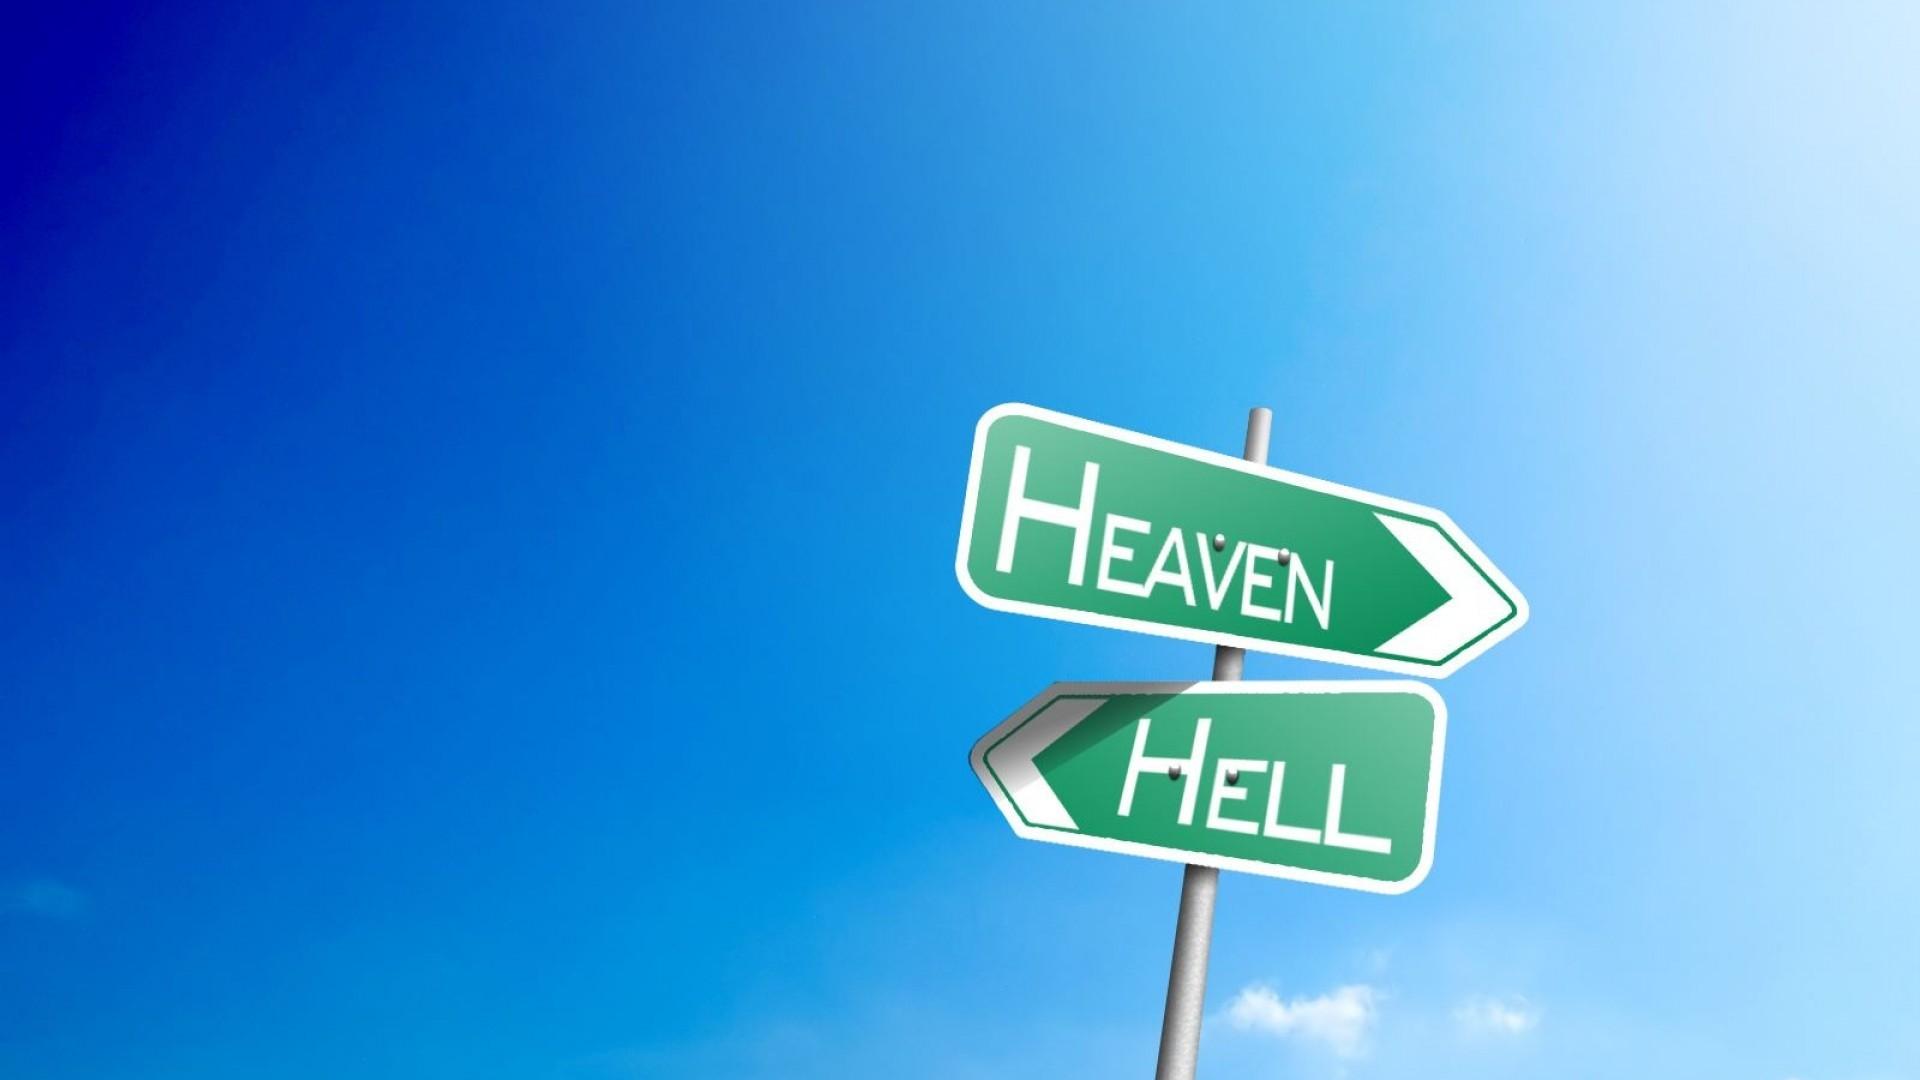 Hell Heaven inspirational sign road sign wallpaper     213412    WallpaperUP